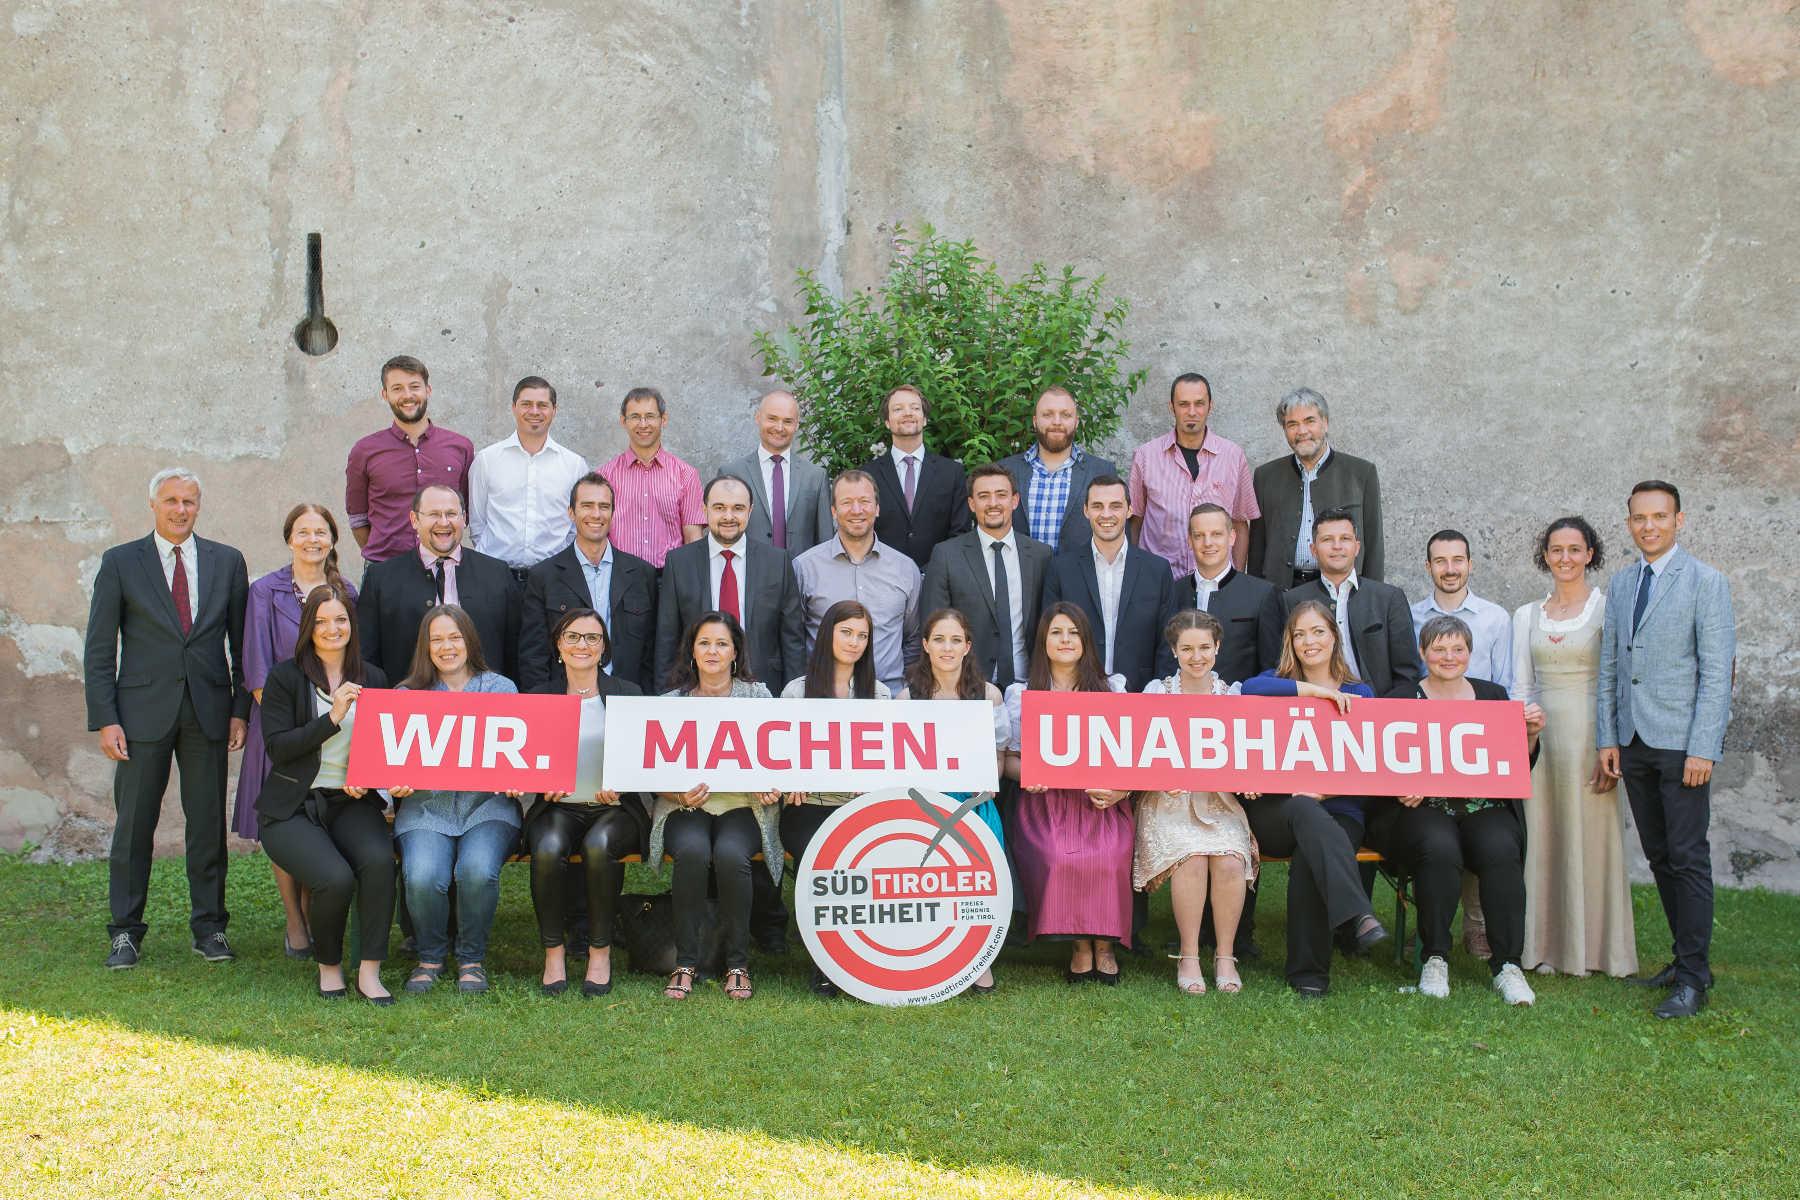 LandtagswahlKandidatenliste vollständig – Reihung beschlossen